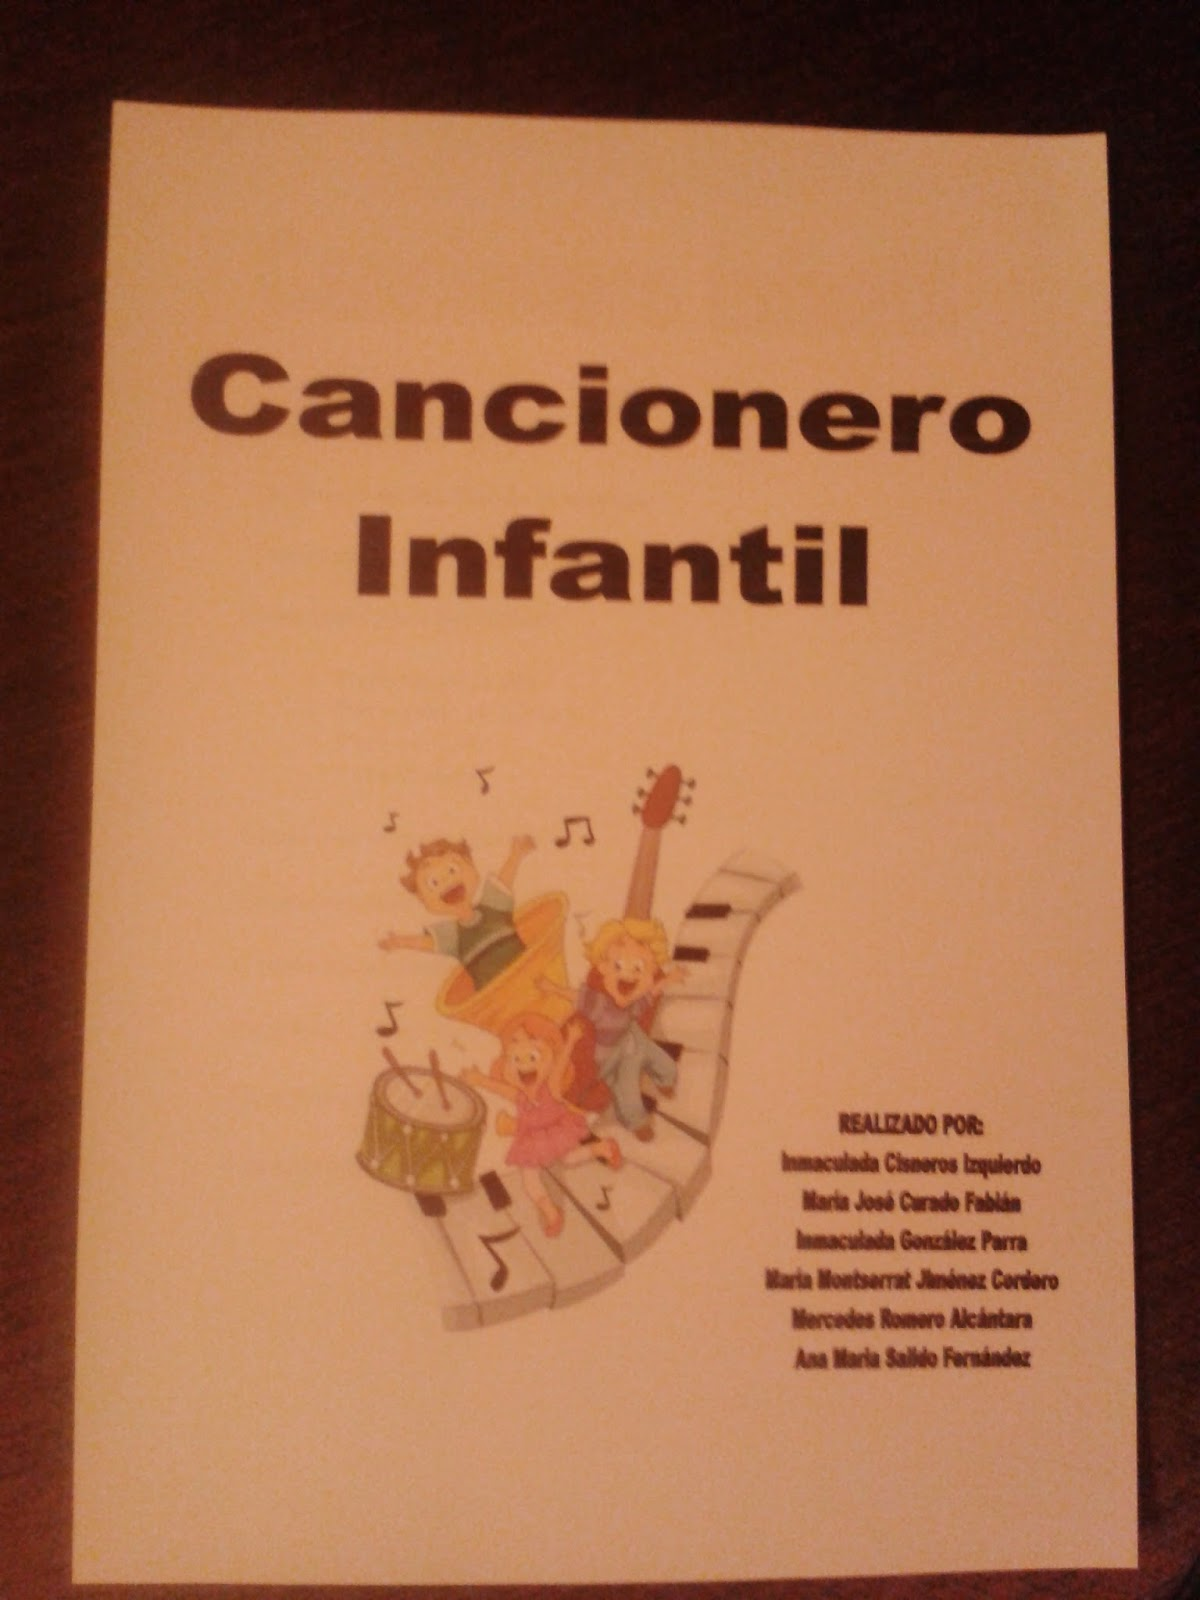 http://colaboraeducacion.juntadeandalucia.es/educacion/colabora/documents/13502559/7b8f0695-e4d9-4e48-bb84-8c8152916d67